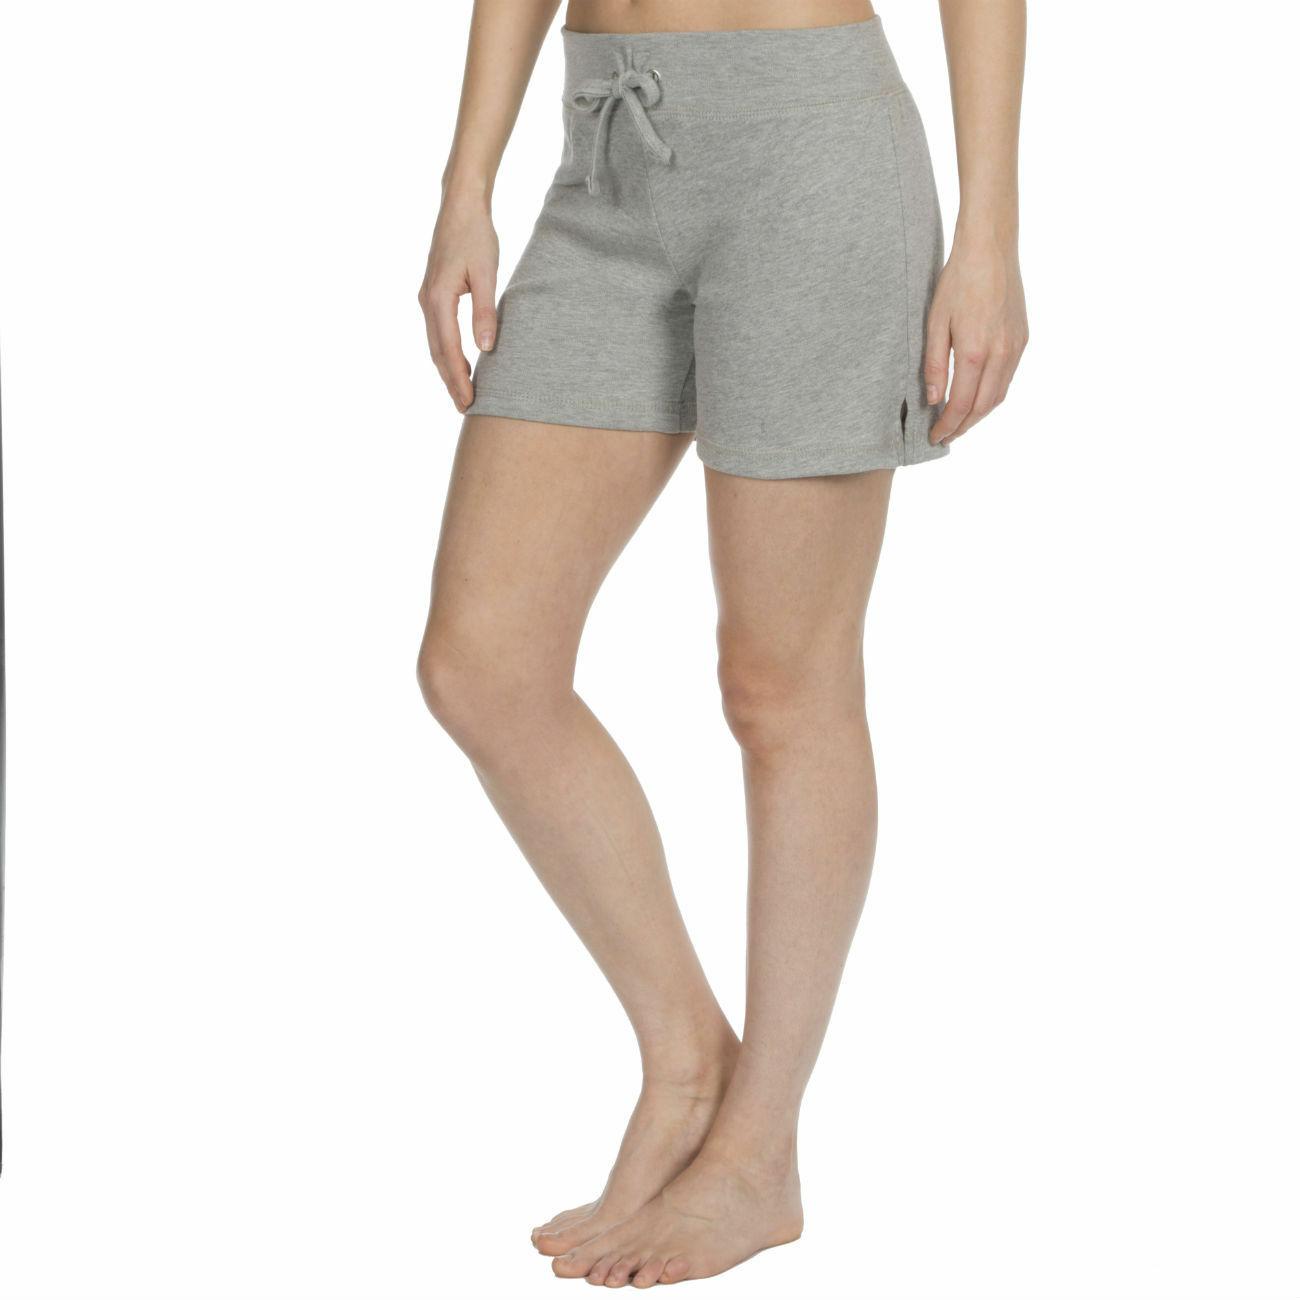 Womens-Cotton-Jersey-Shorts-Elastic-Waist-Summer-Beach-Casual-Yoga-Hot-Pants-New thumbnail 8